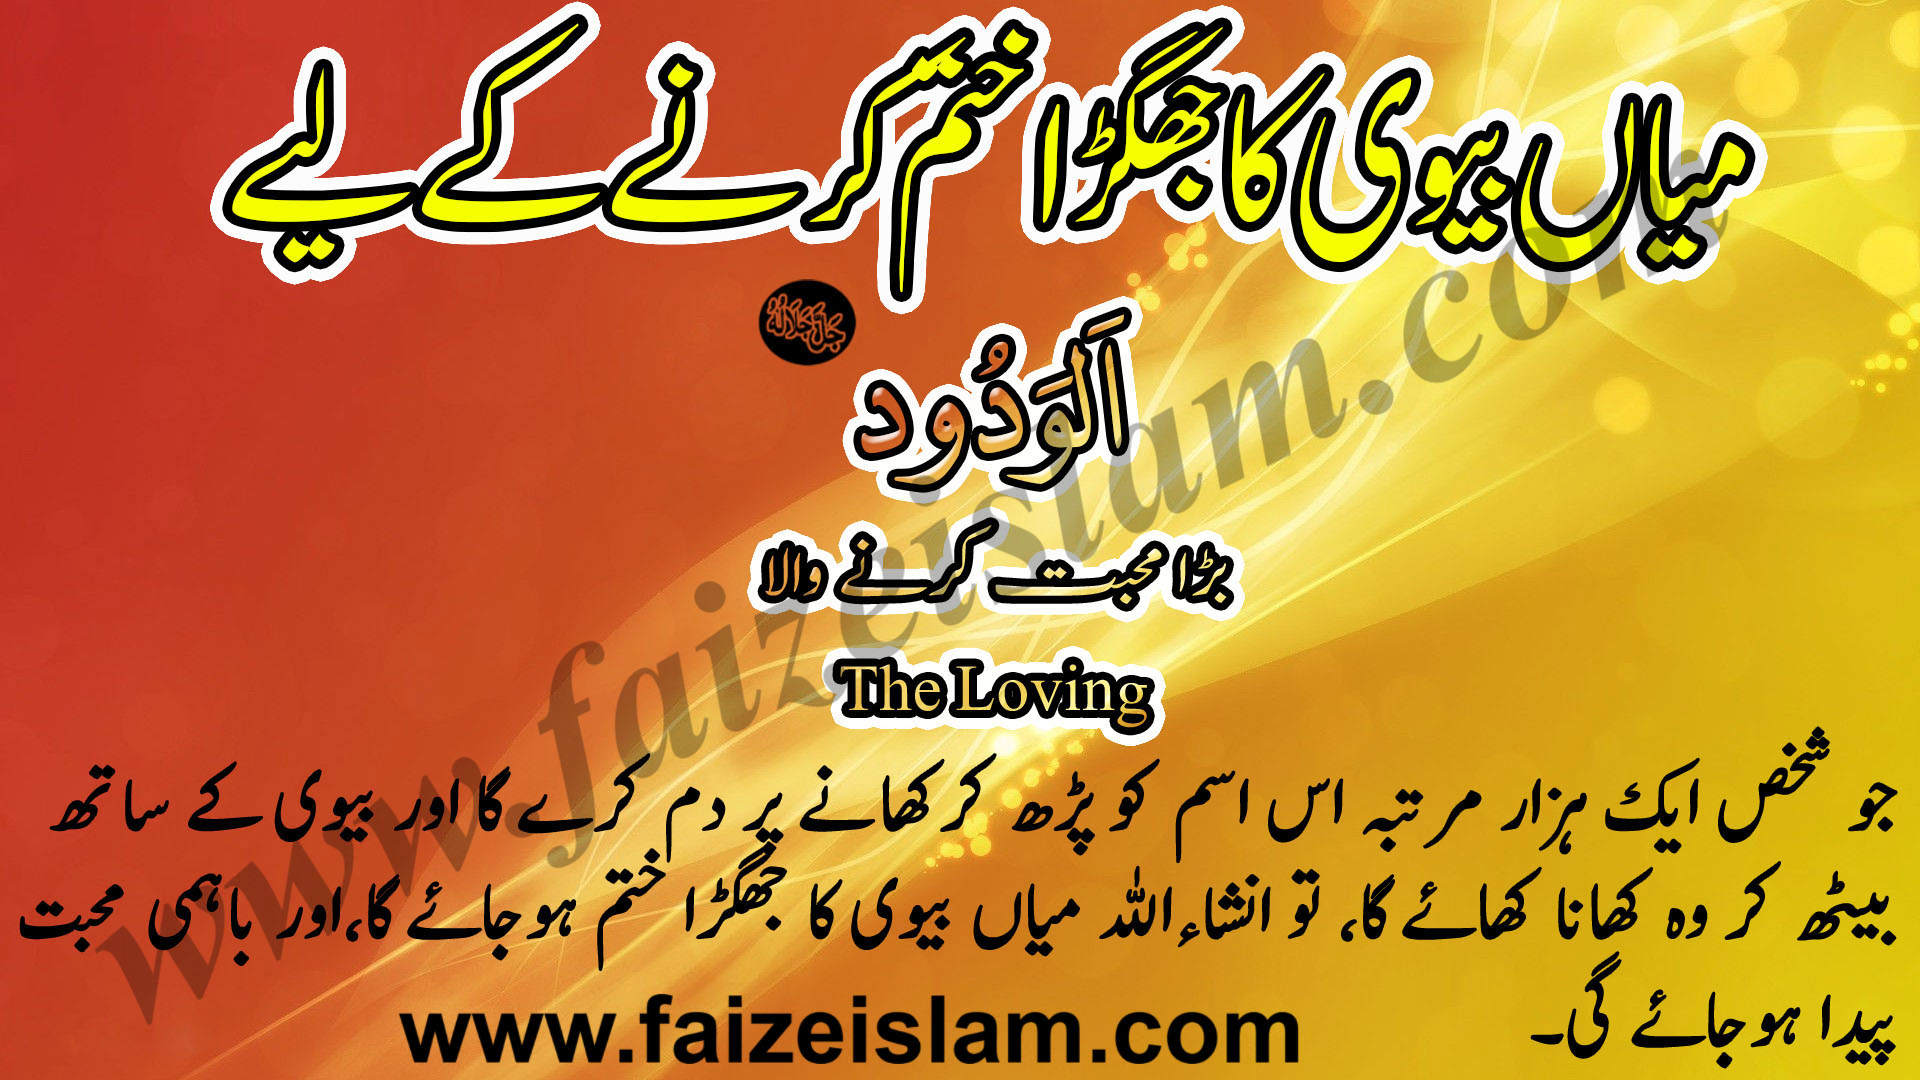 Photo of Mian Biwi Ka Jhagra Khatam Karnay Kay Liye Wazifa In Urdu